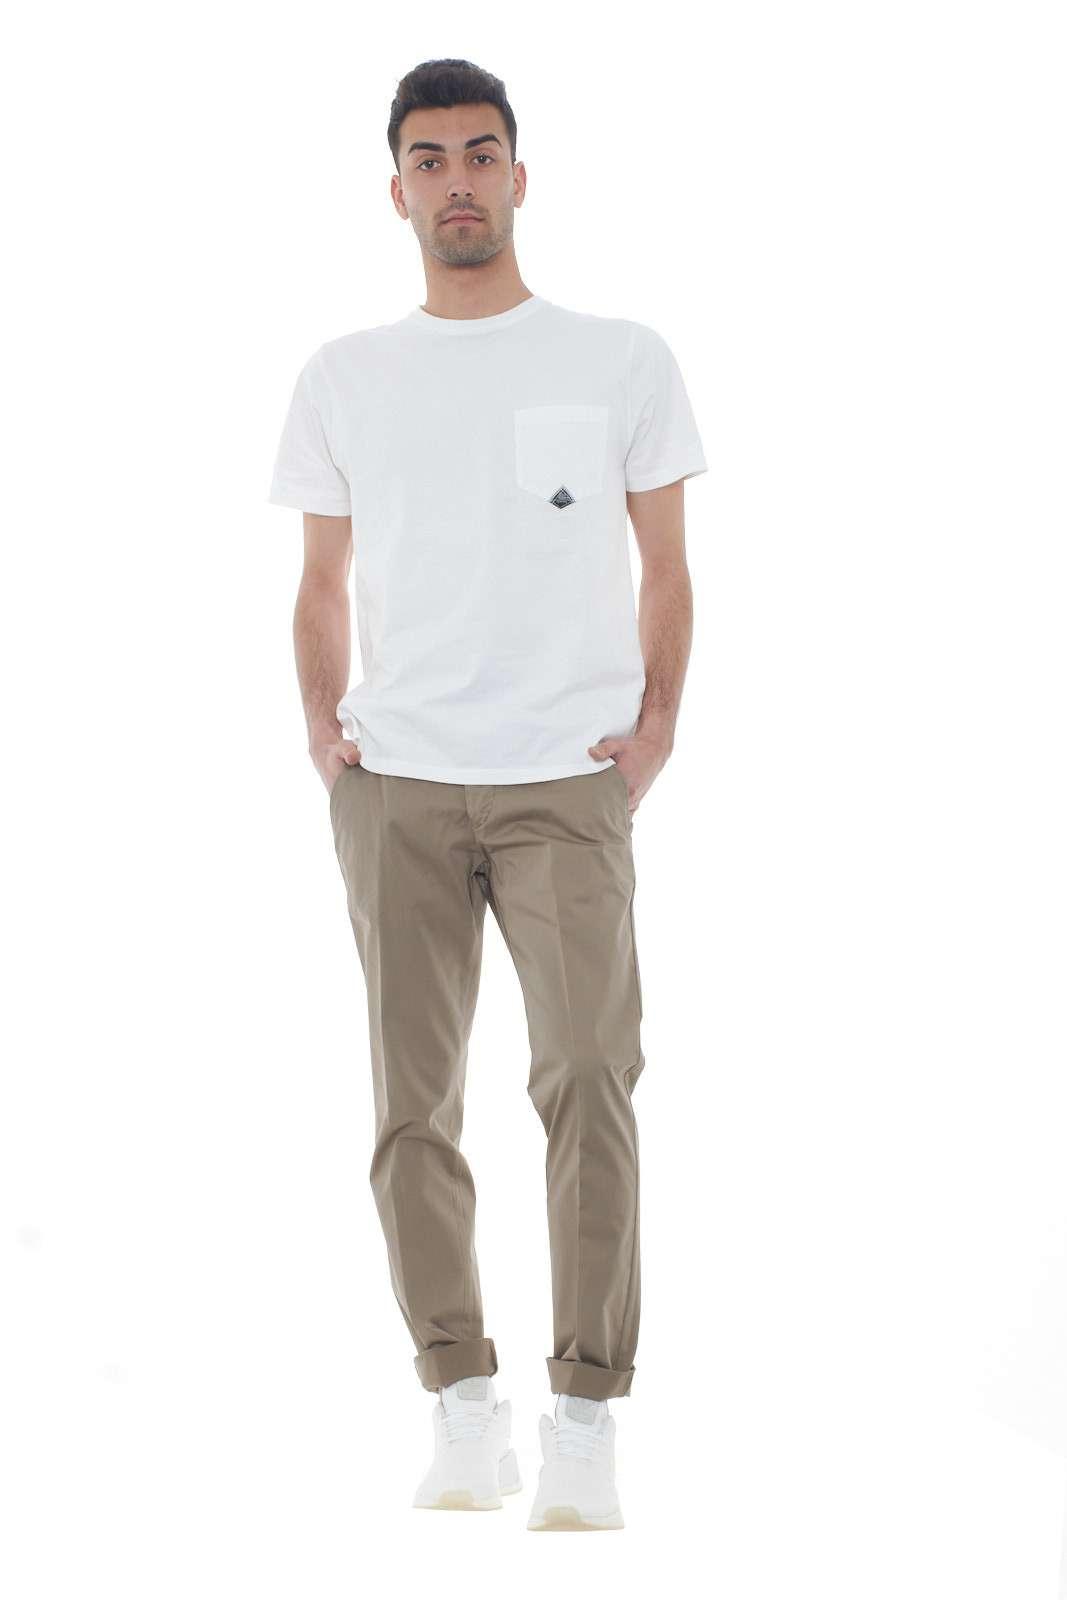 https://www.parmax.com/media/catalog/product/a/i/PE-outlet_parmax-pantaloni-uomo-Desica-POSITANORASO-D.jpg